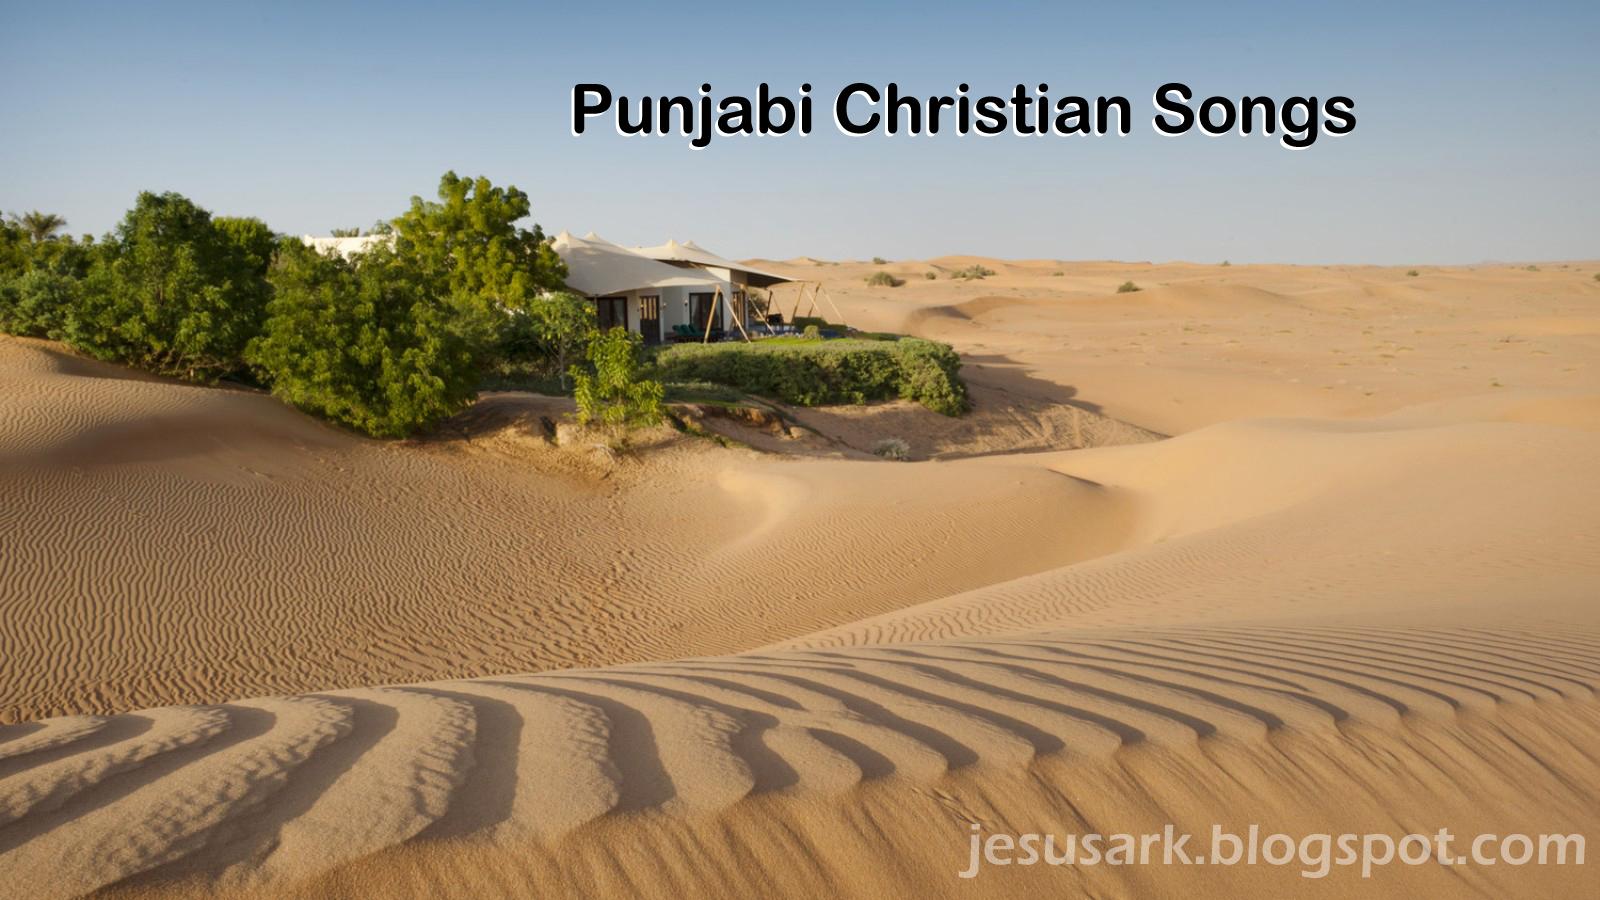 Punjabi Christian Songs Free Download - JESUS ARK